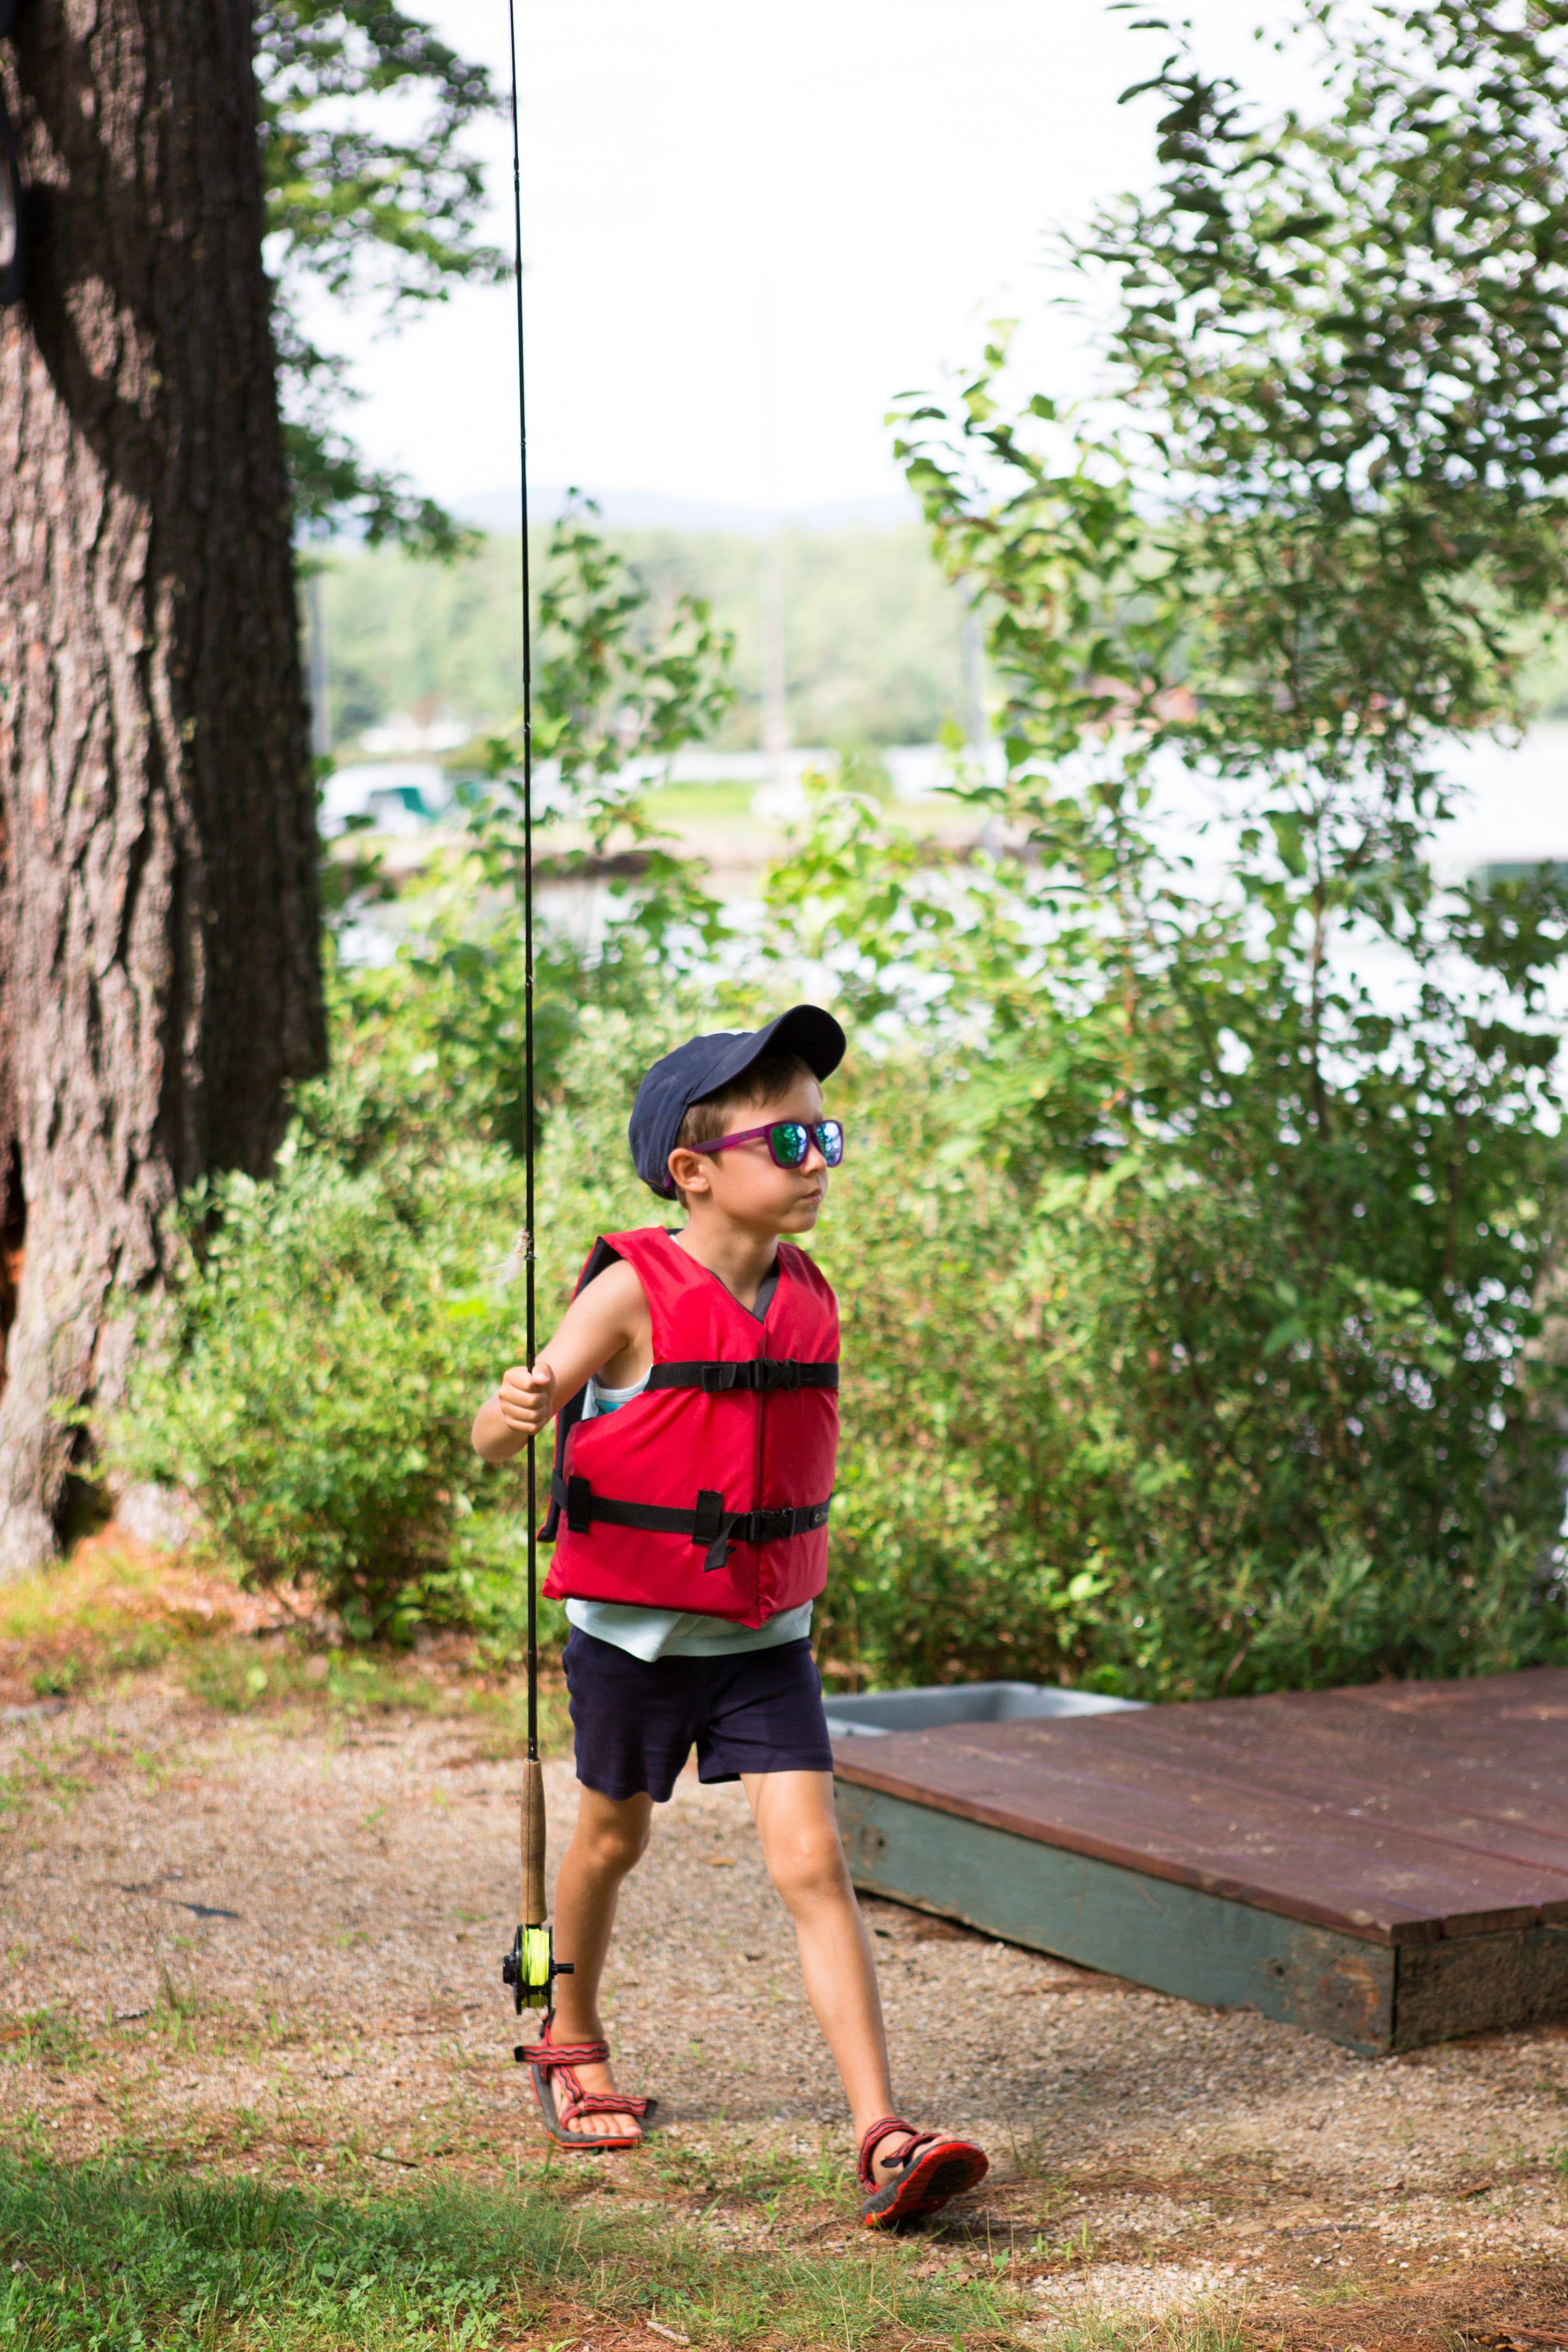 A young boy walking holding a fishing rod